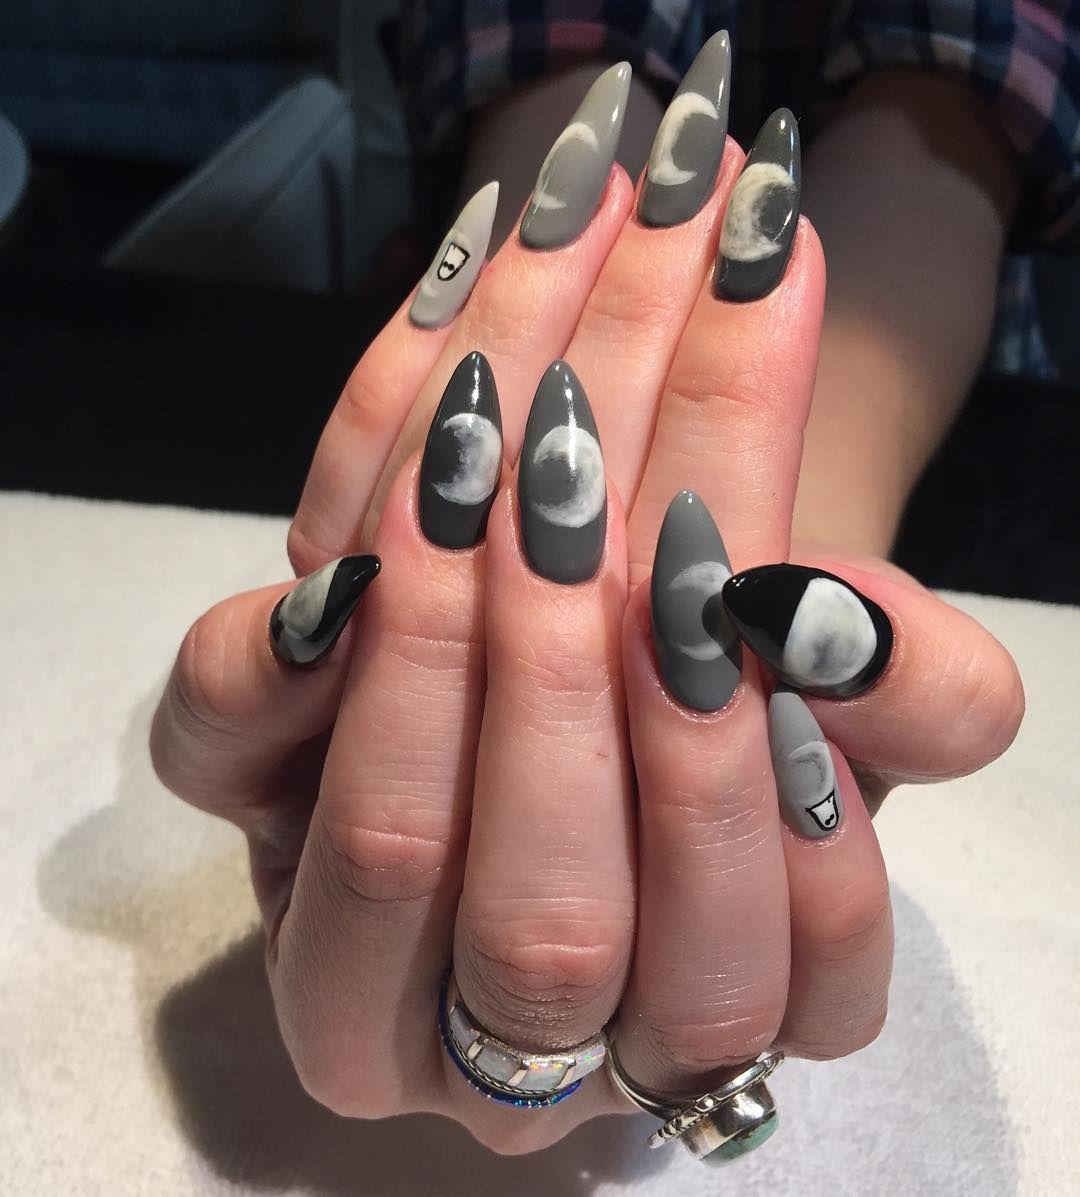 Heynicenails Nails Pinterest Ps